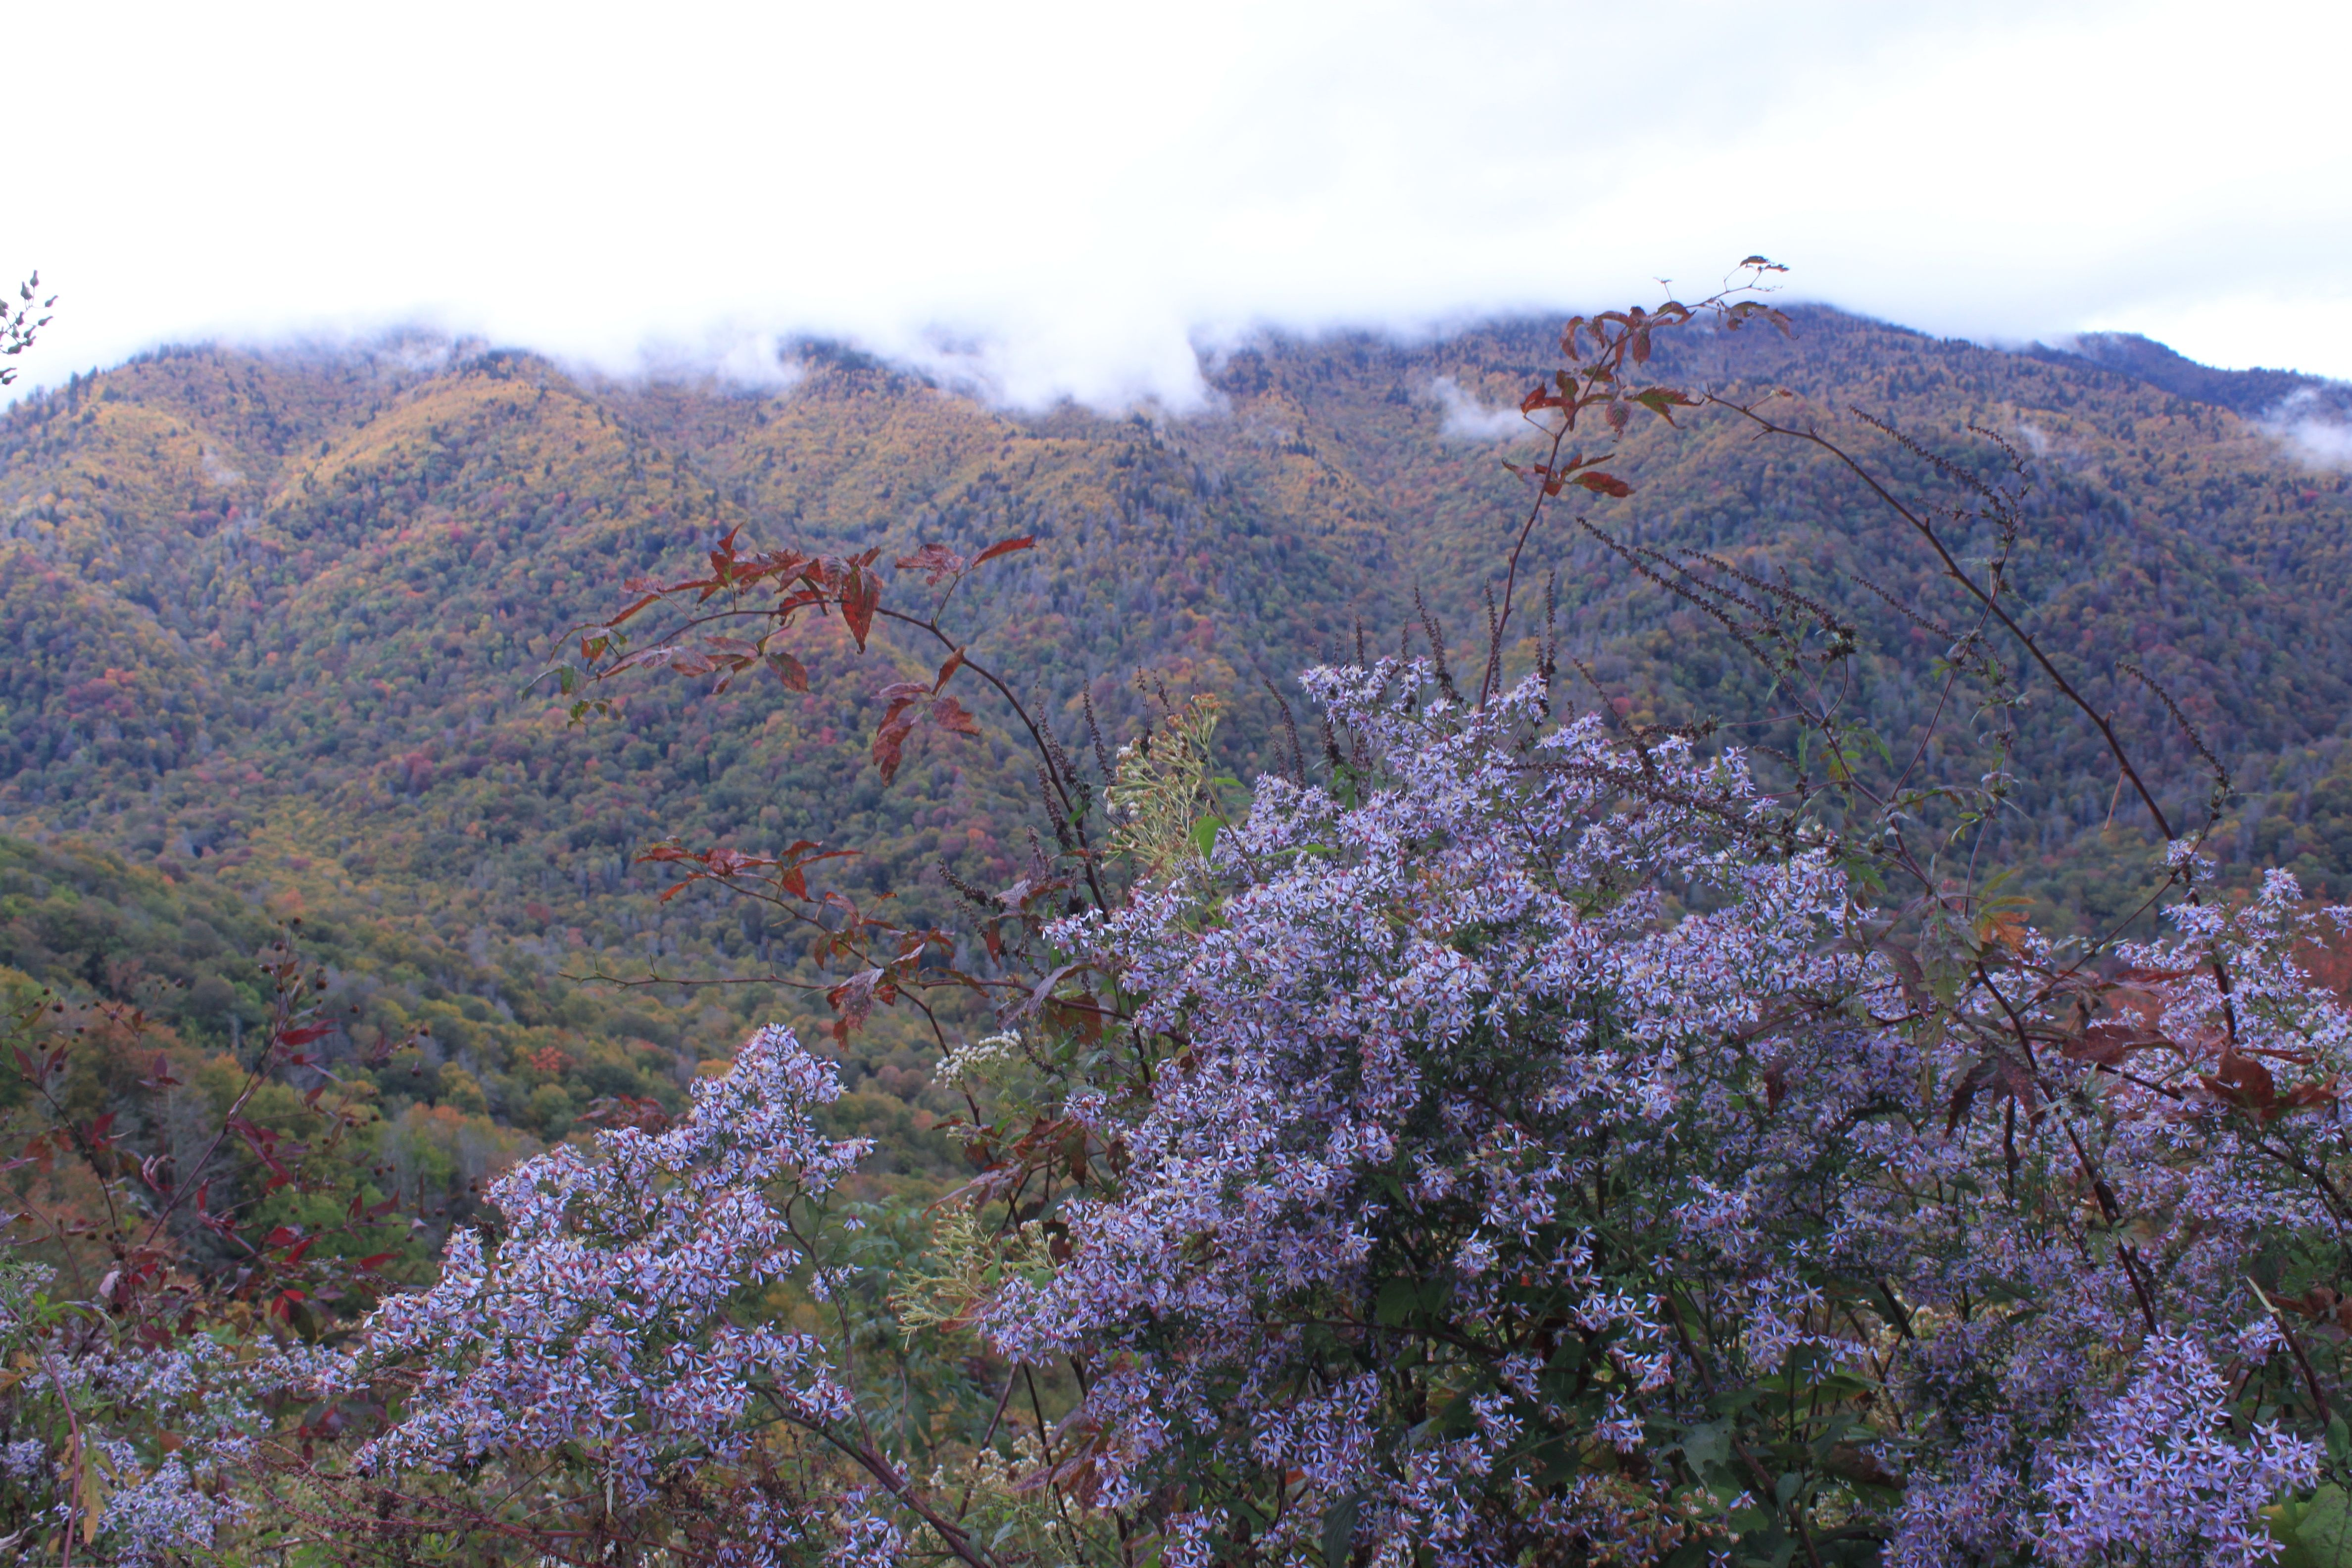 Great Smokey Mountains National Park -- scenic one hour drive between Gatlinburg, TN & Cherokee, N.C.